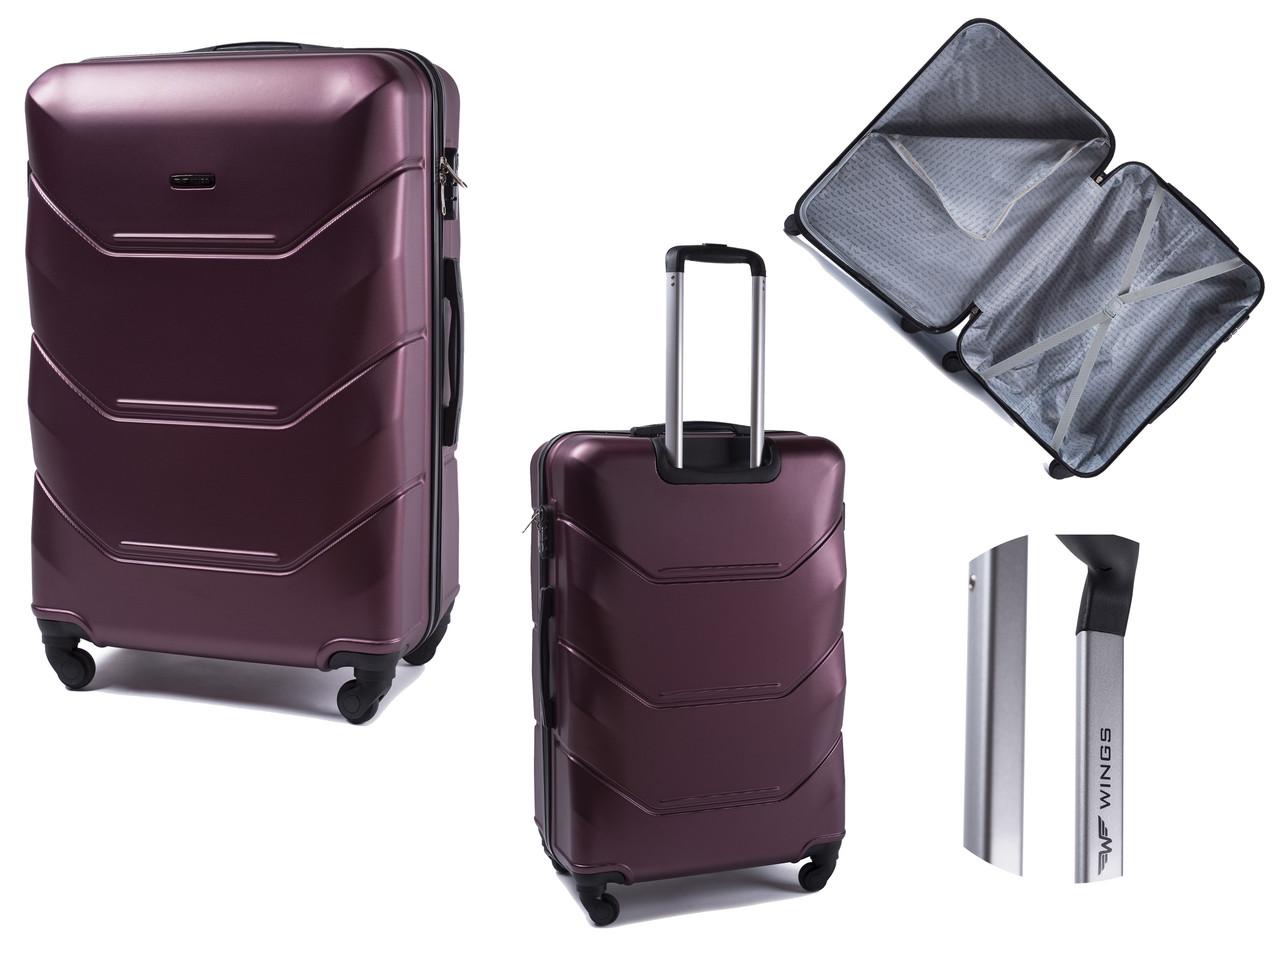 9e0506b9b0be Большой пластиковый чемодан Wings 147 на 4 колесах: продажа, цена в ...